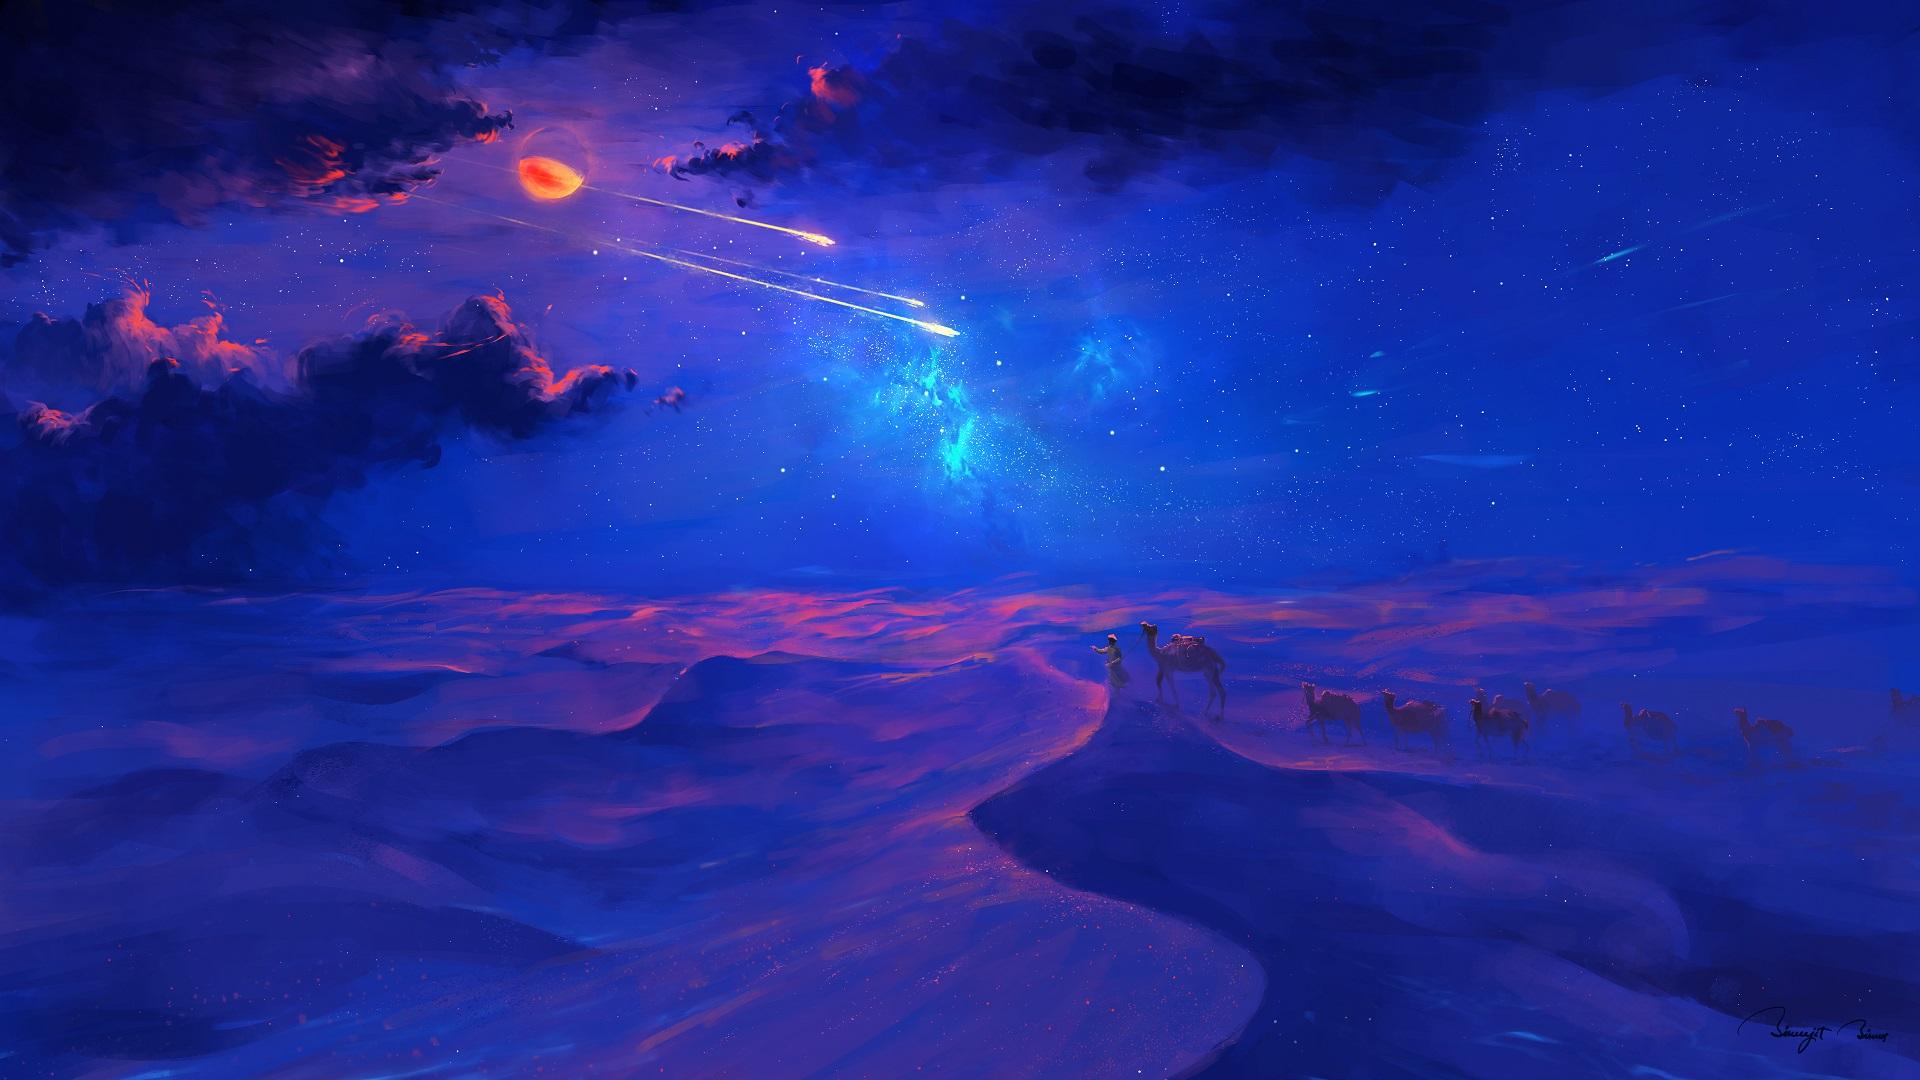 General 1920x1080 BisBiswas digital art fantasy art camels desert stars clouds shooting stars Moon lunar eclipses